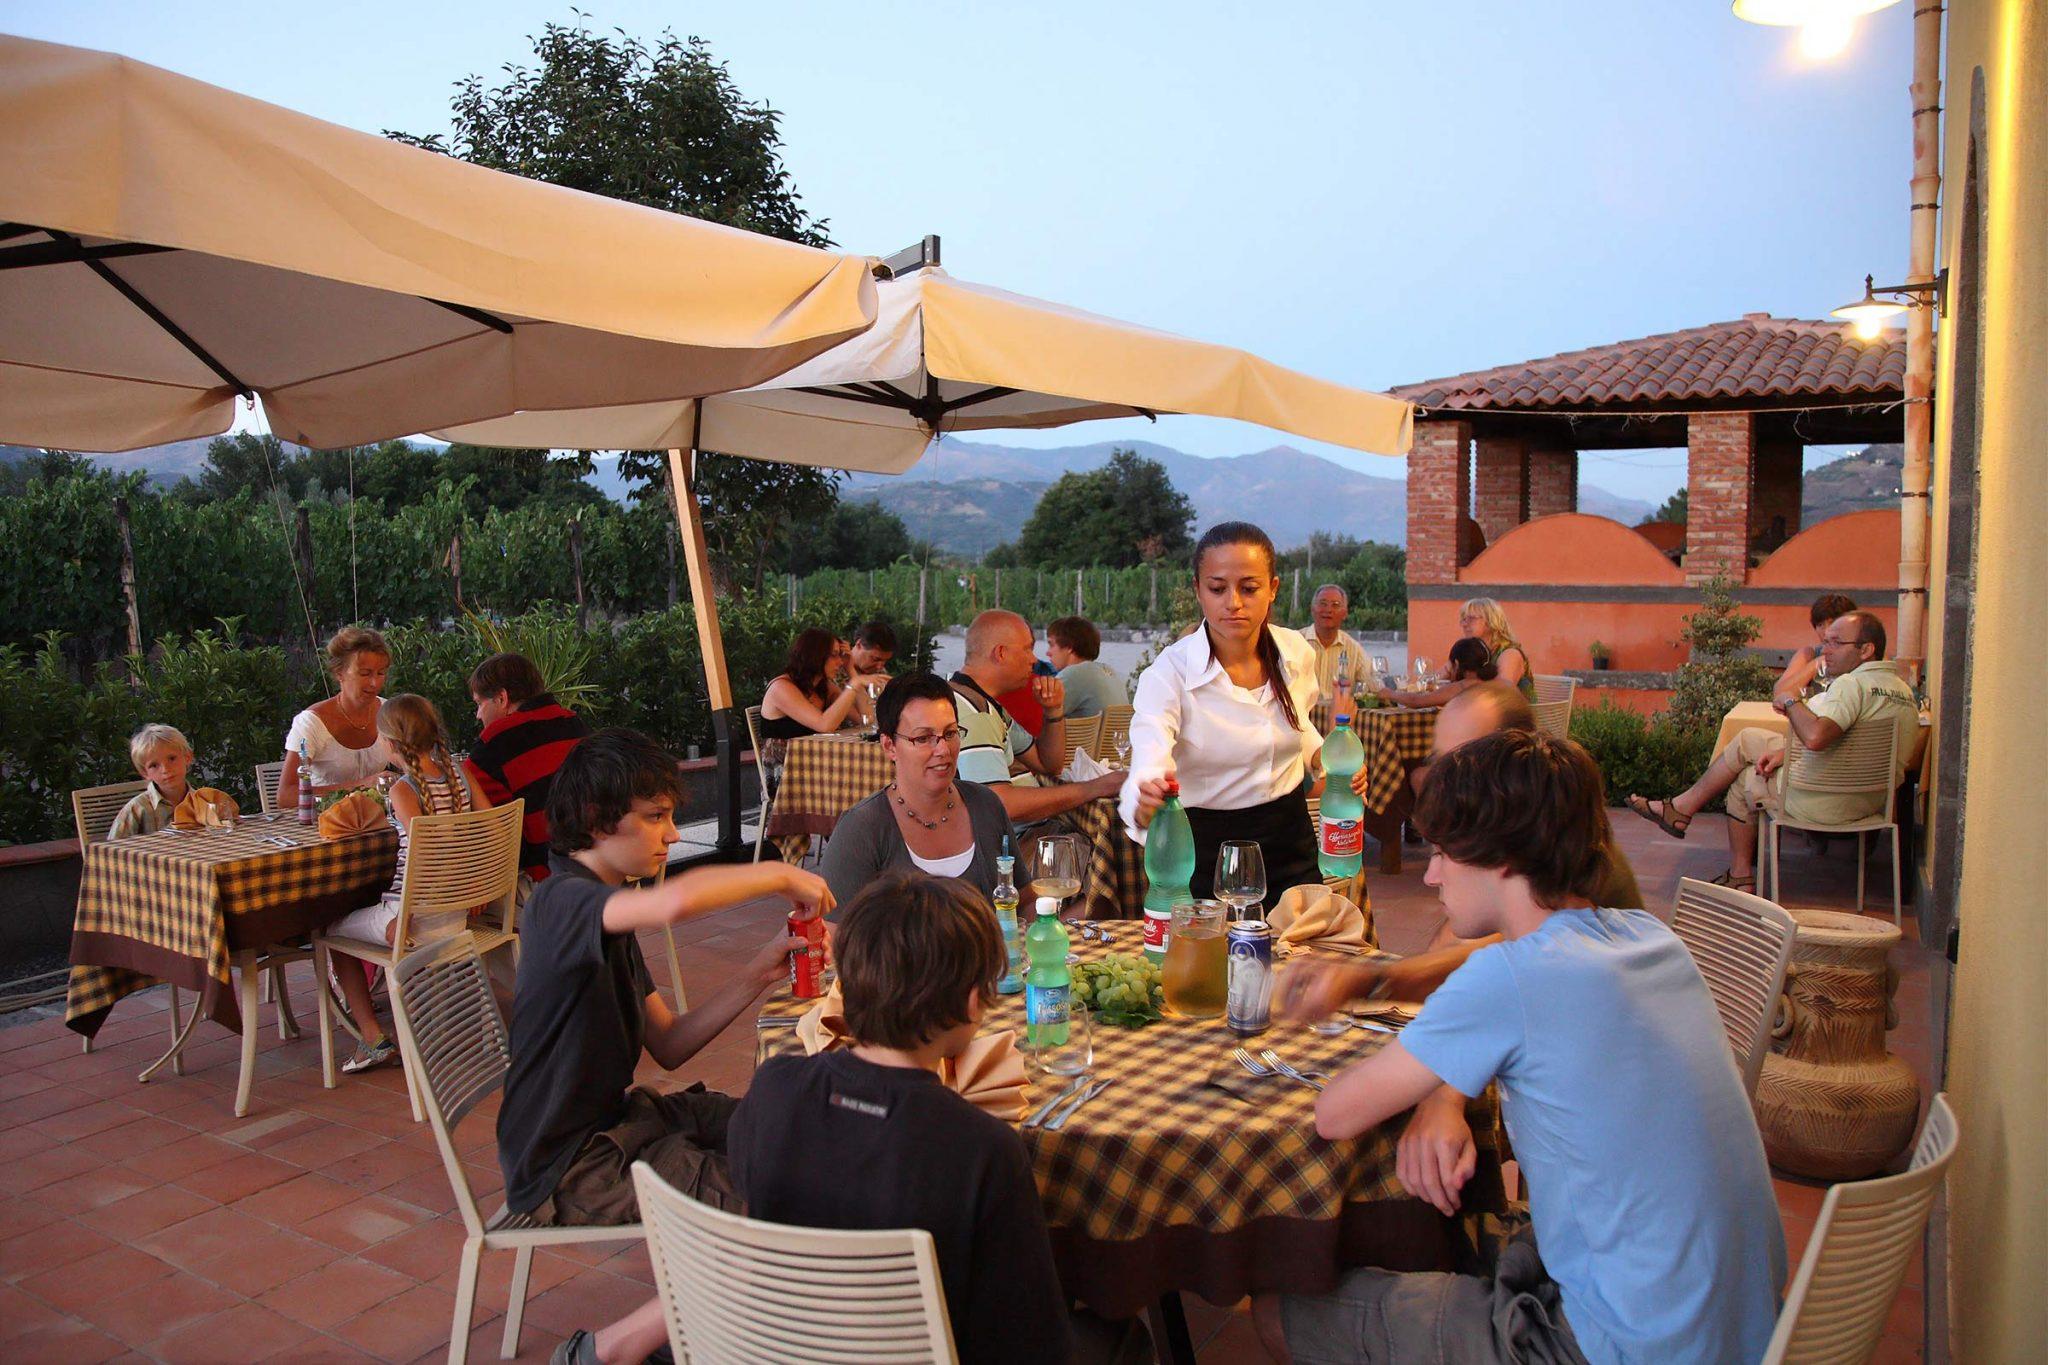 Trattoria/restaurant